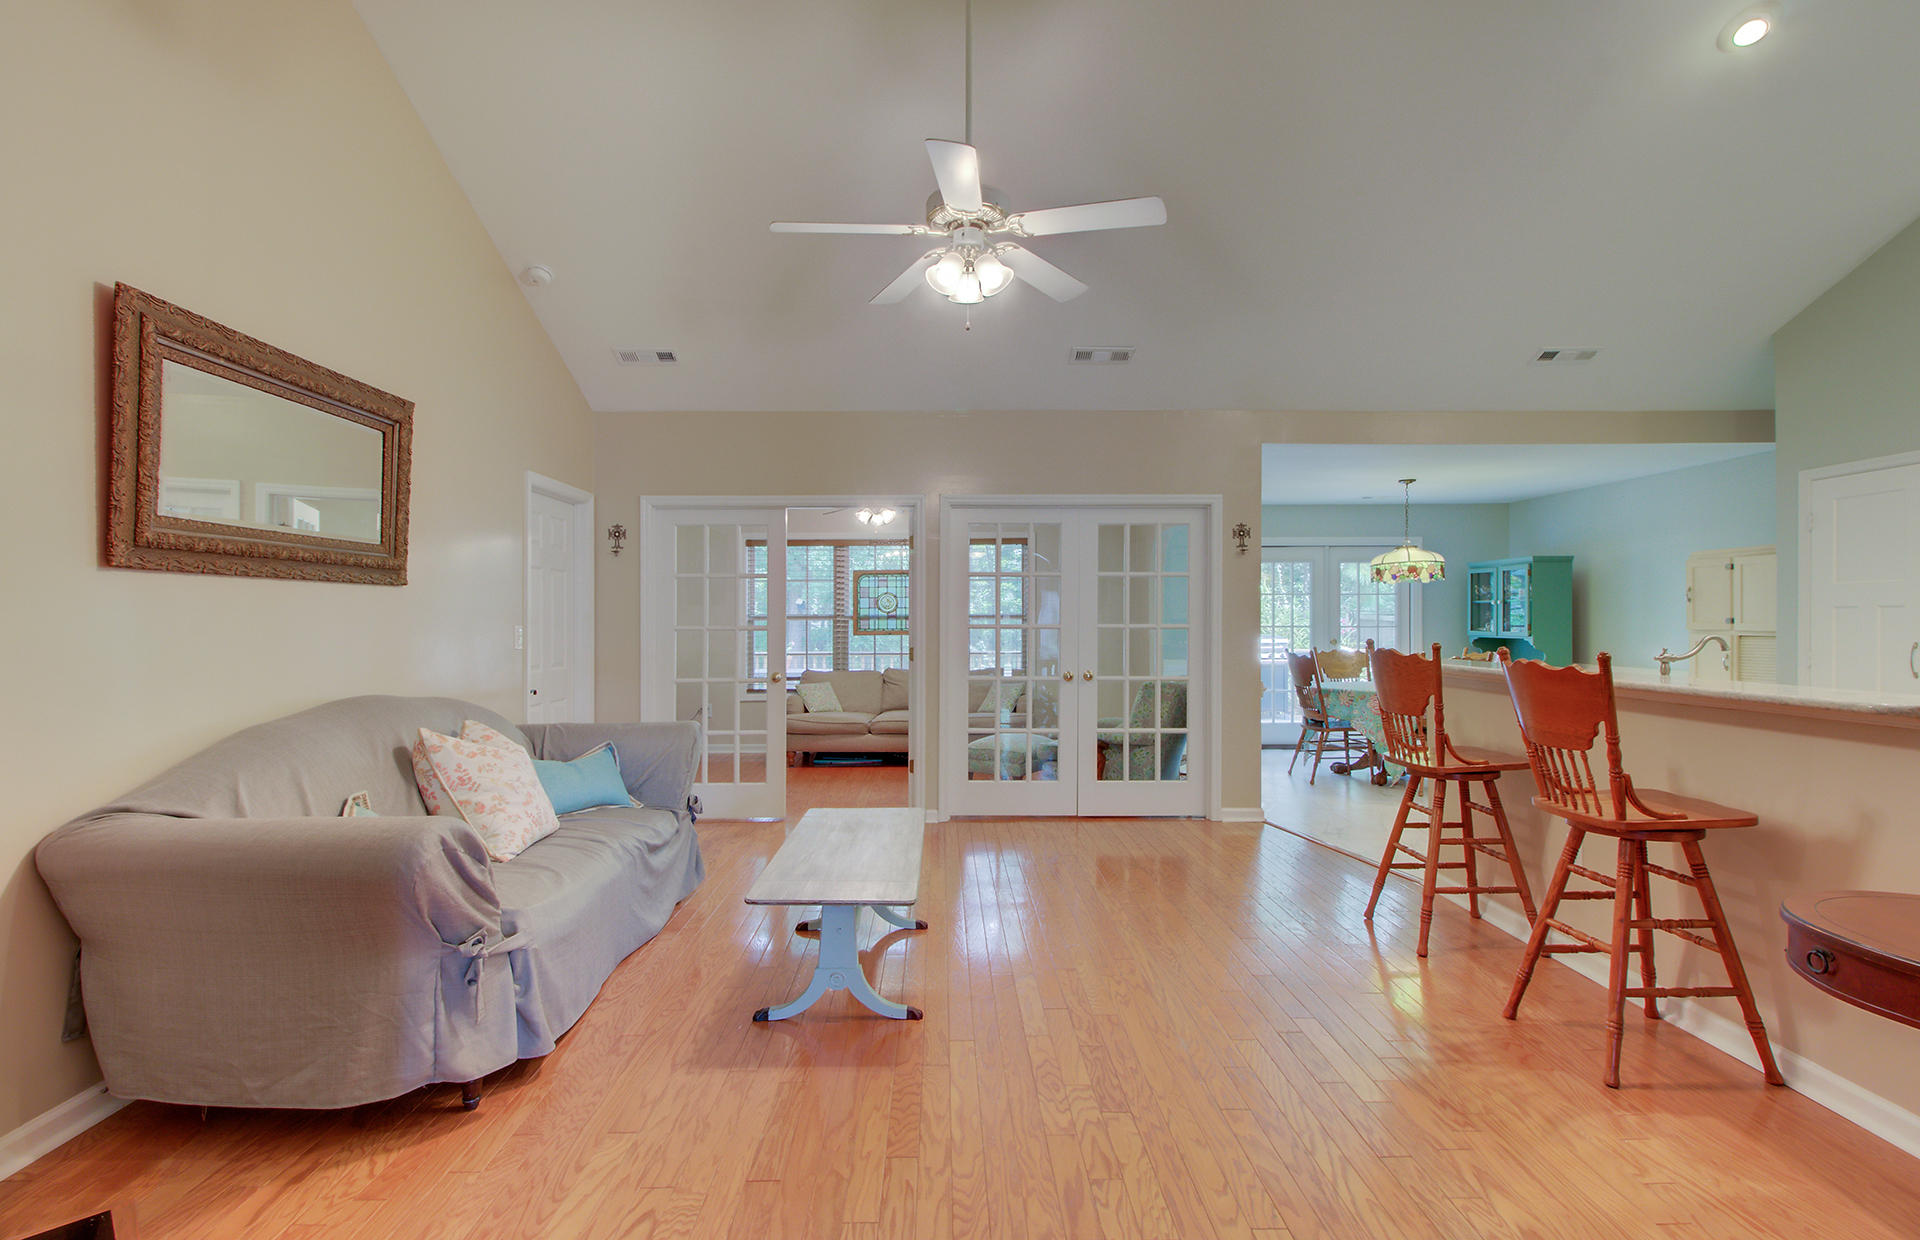 Park West Homes For Sale - 1500 Wellesley, Mount Pleasant, SC - 23